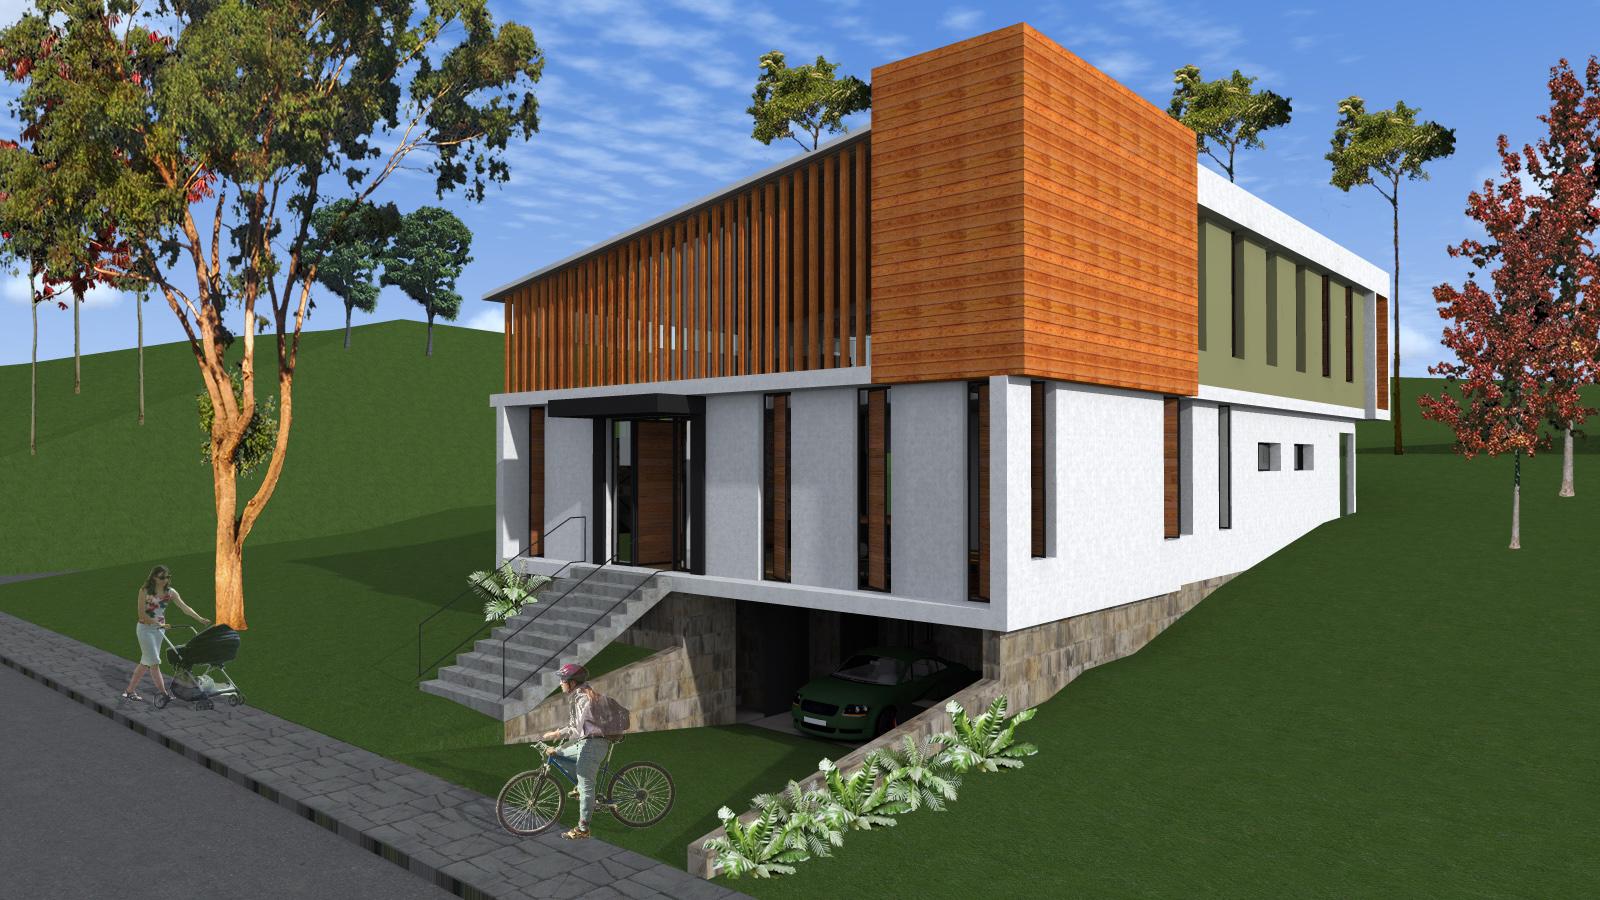 CASA ALPHAVILLE « TETO Arquitetura Sustentável e Paisagismo  #2057AB 1600x900 Arquitetura Sustentavel Banheiro